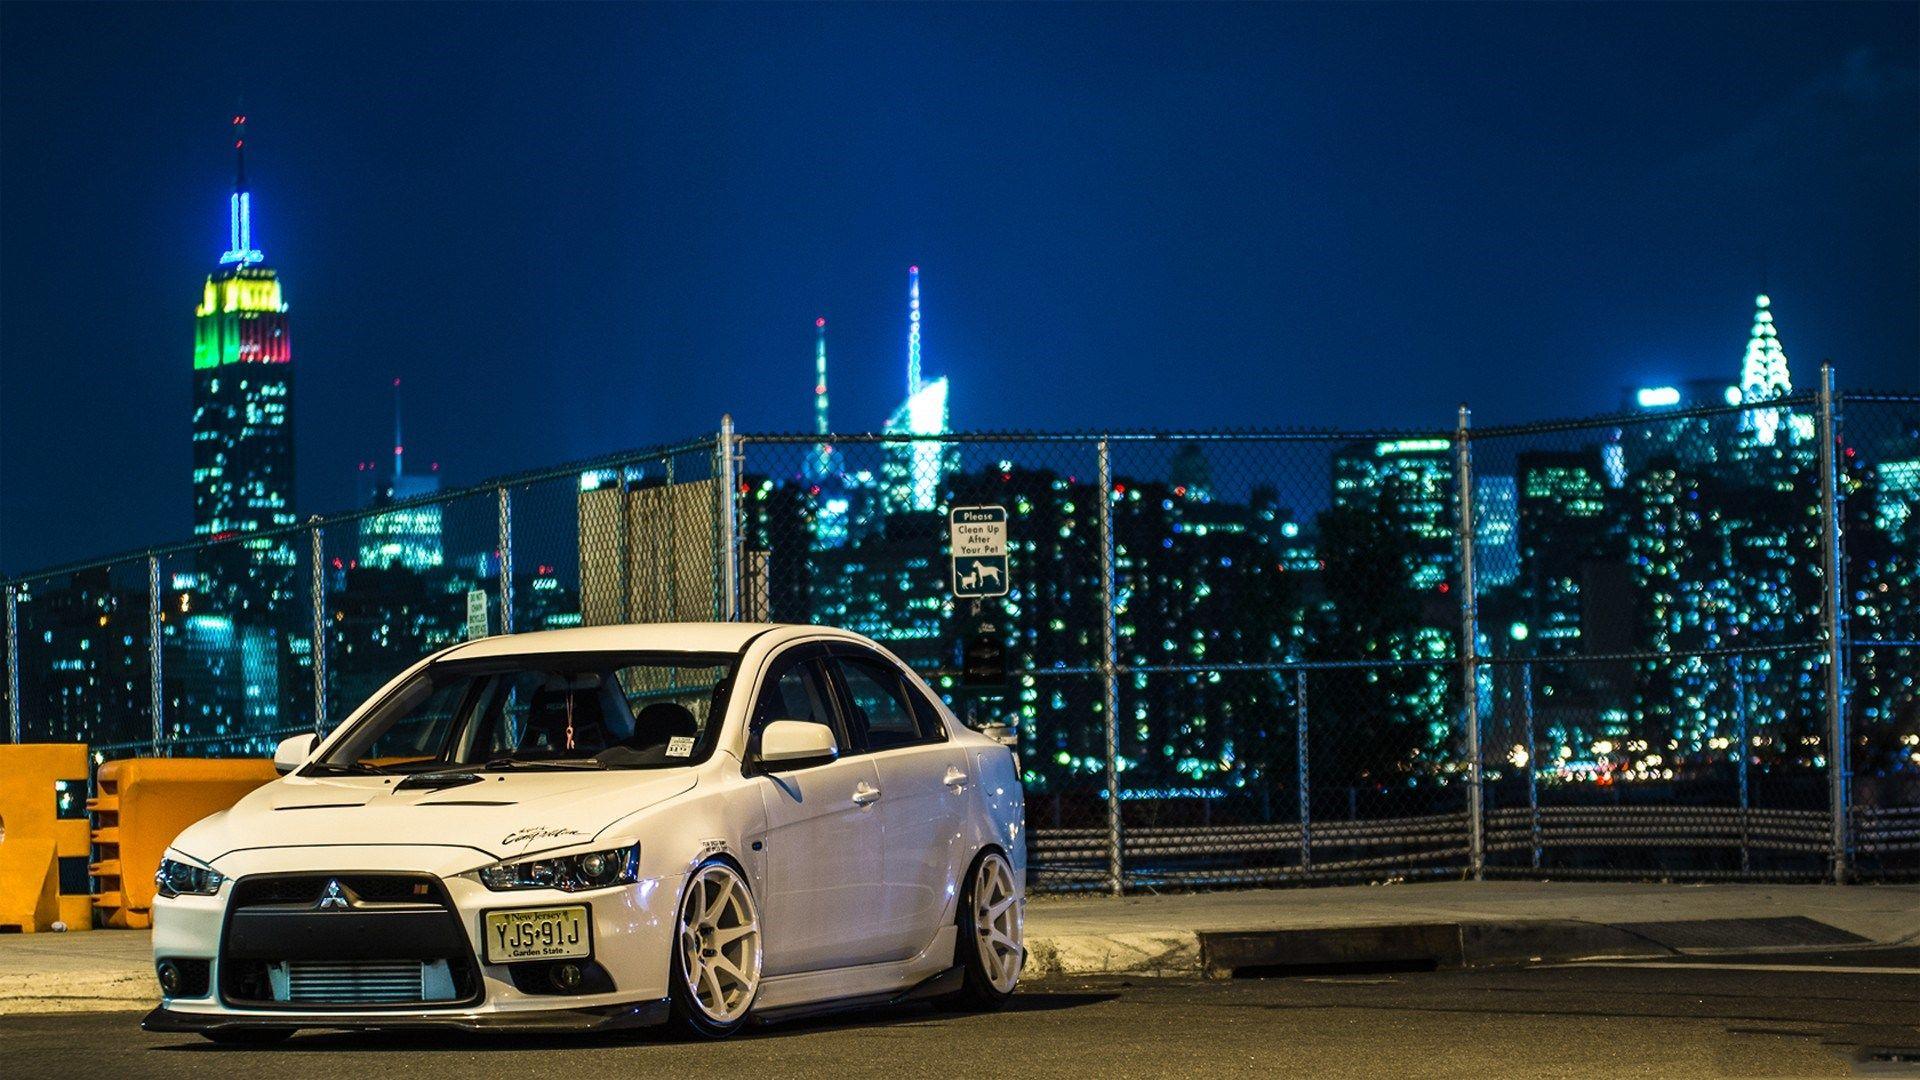 2013 Mitsubishi Lancer Evolution Hd Background Wallpaper Is